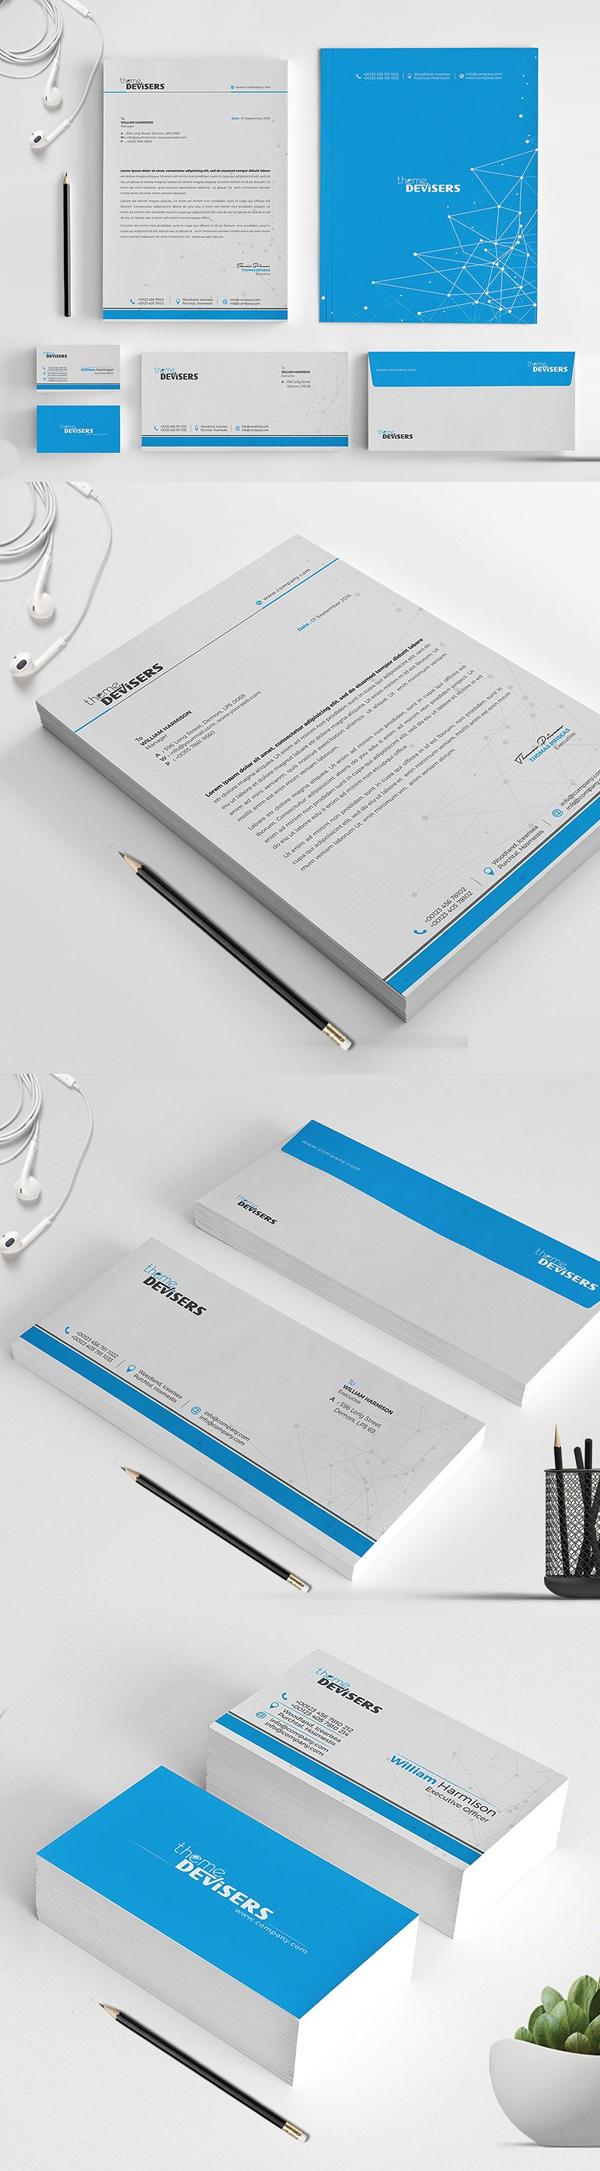 Modern Business Branding / Stationery Templates Design - 16